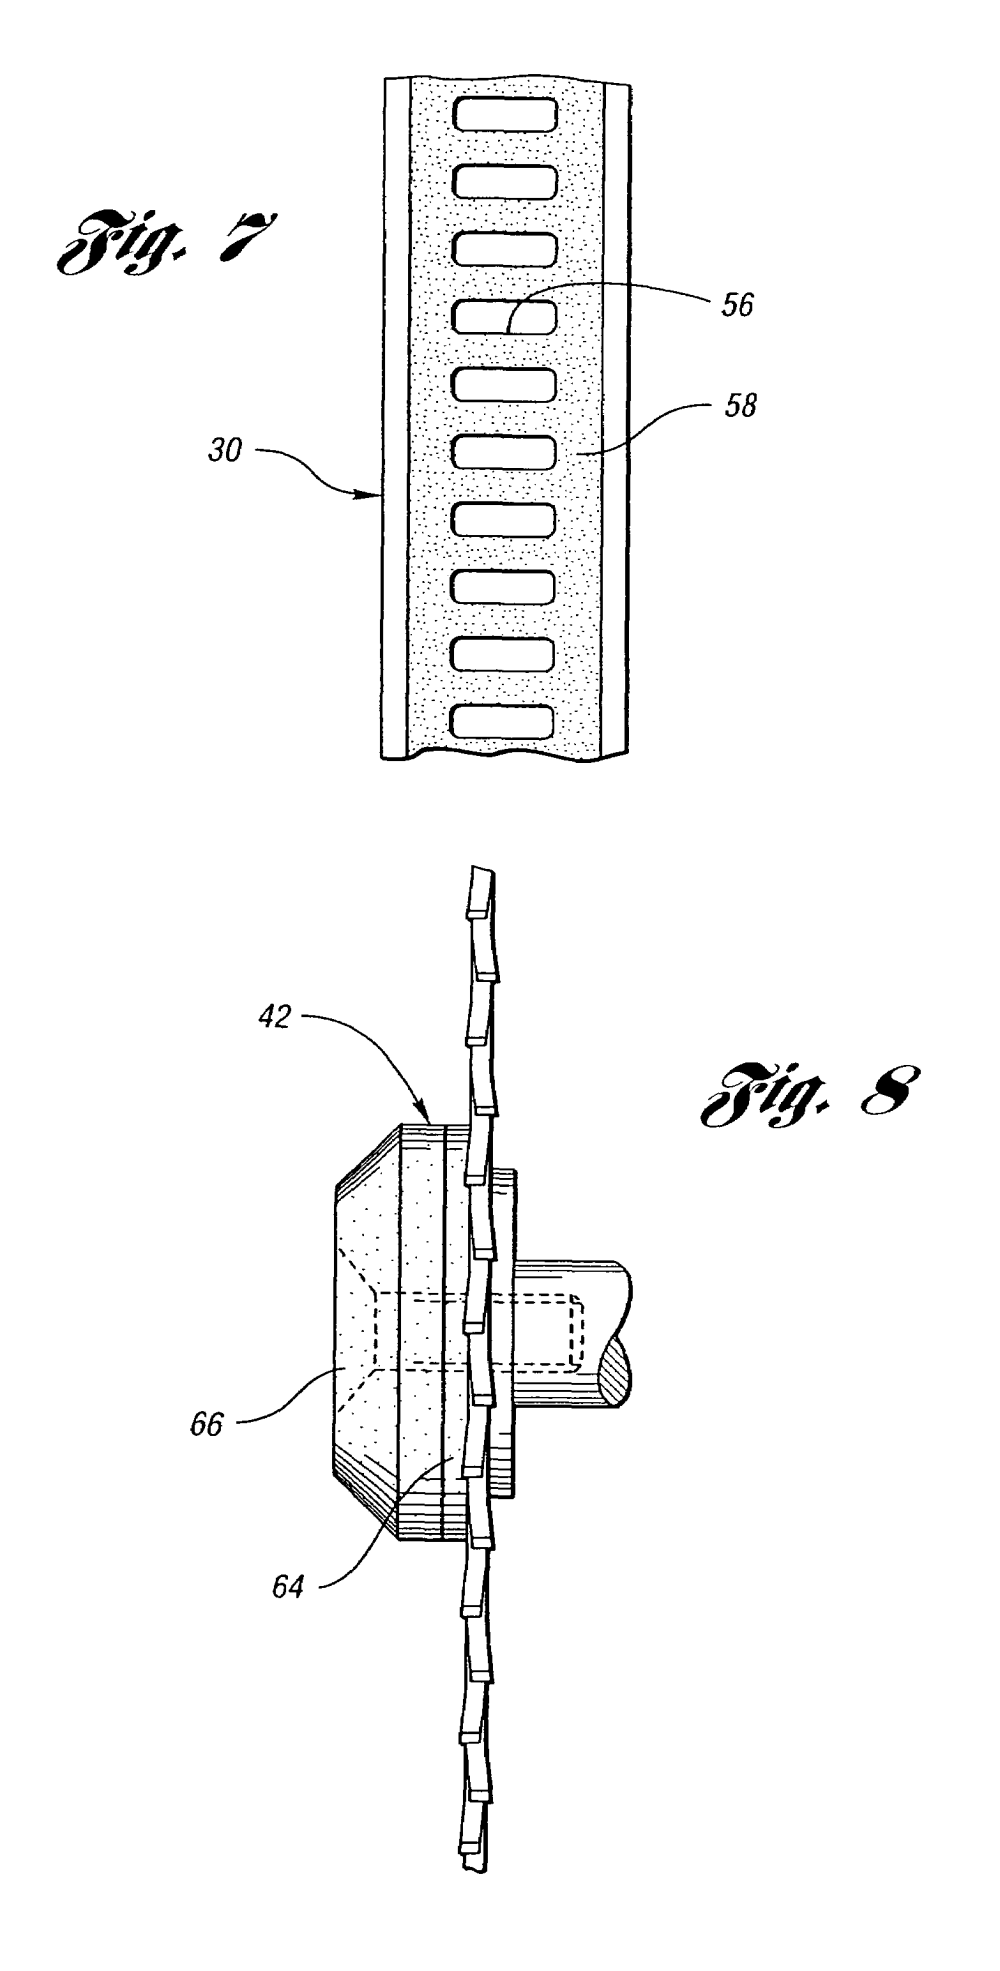 medium resolution of asphalt zipper wiring diagram asphalt pattern asphalt paper microwave oven wiring diagram asphalt zipper wiring diagram